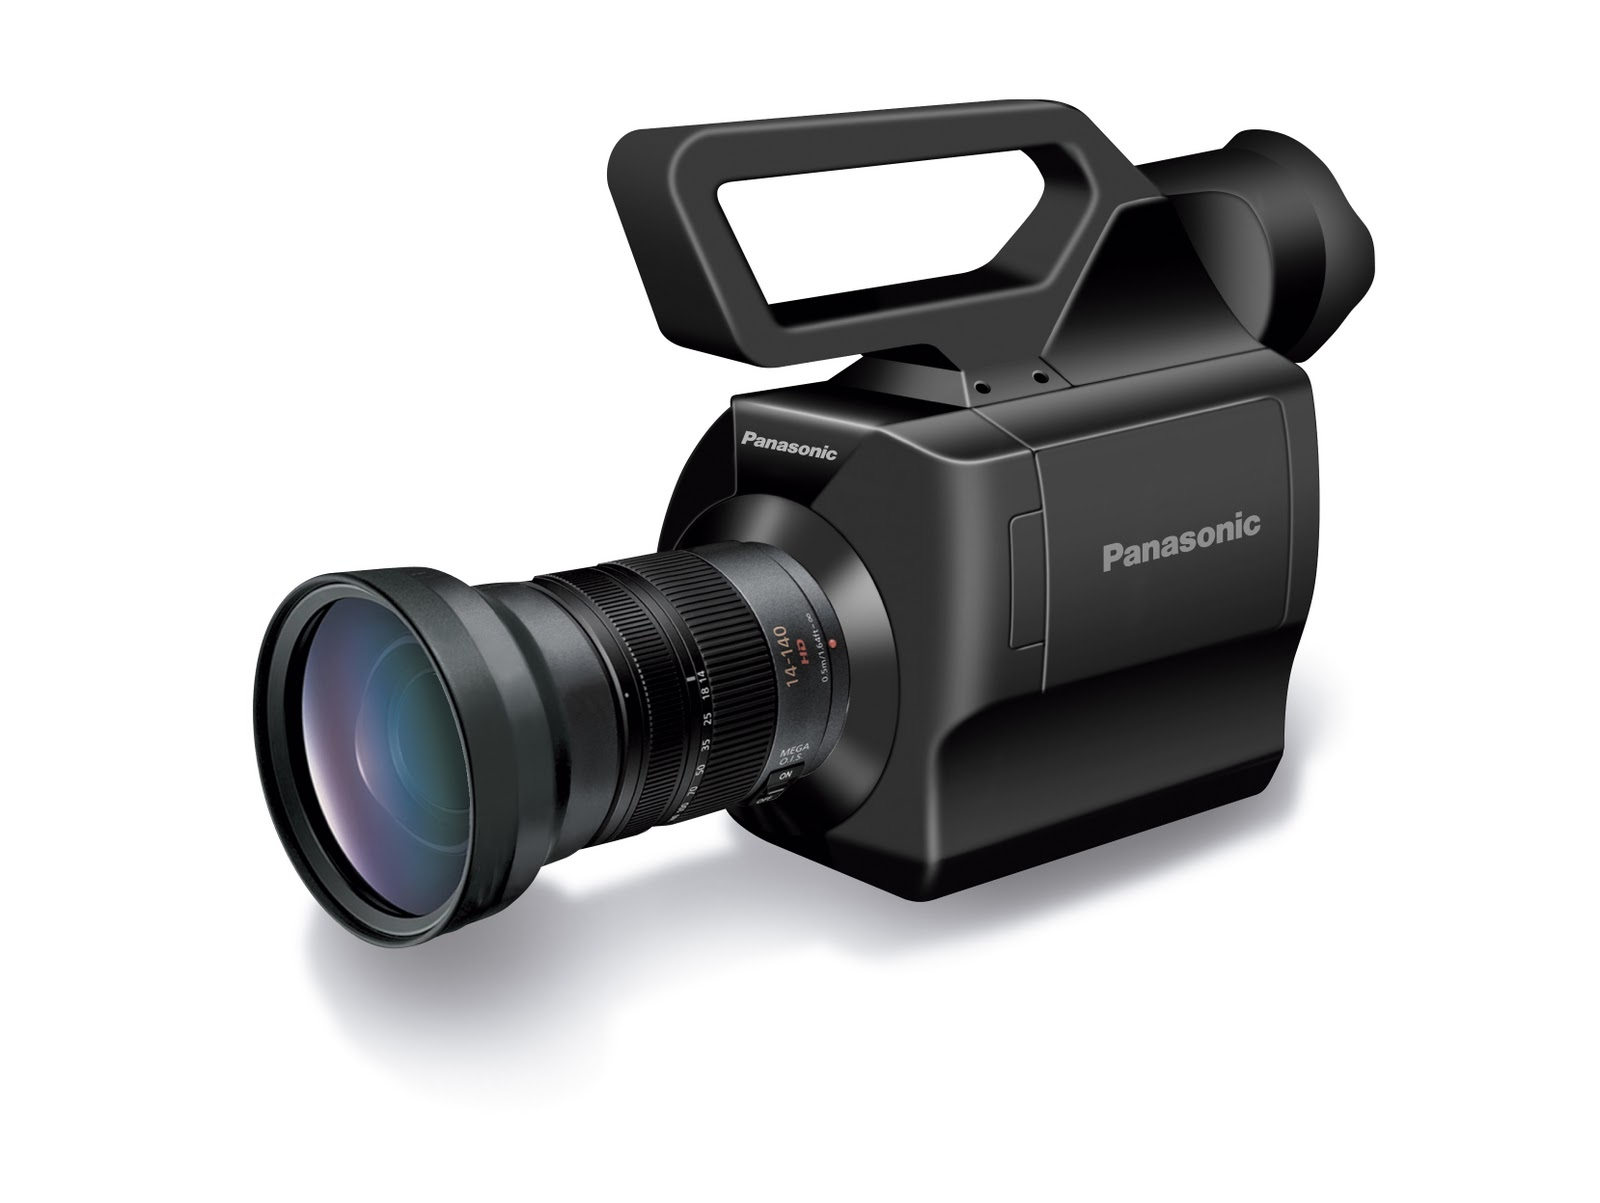 Worldwide tech science panasonic has begun delivering - Low cost camera ...